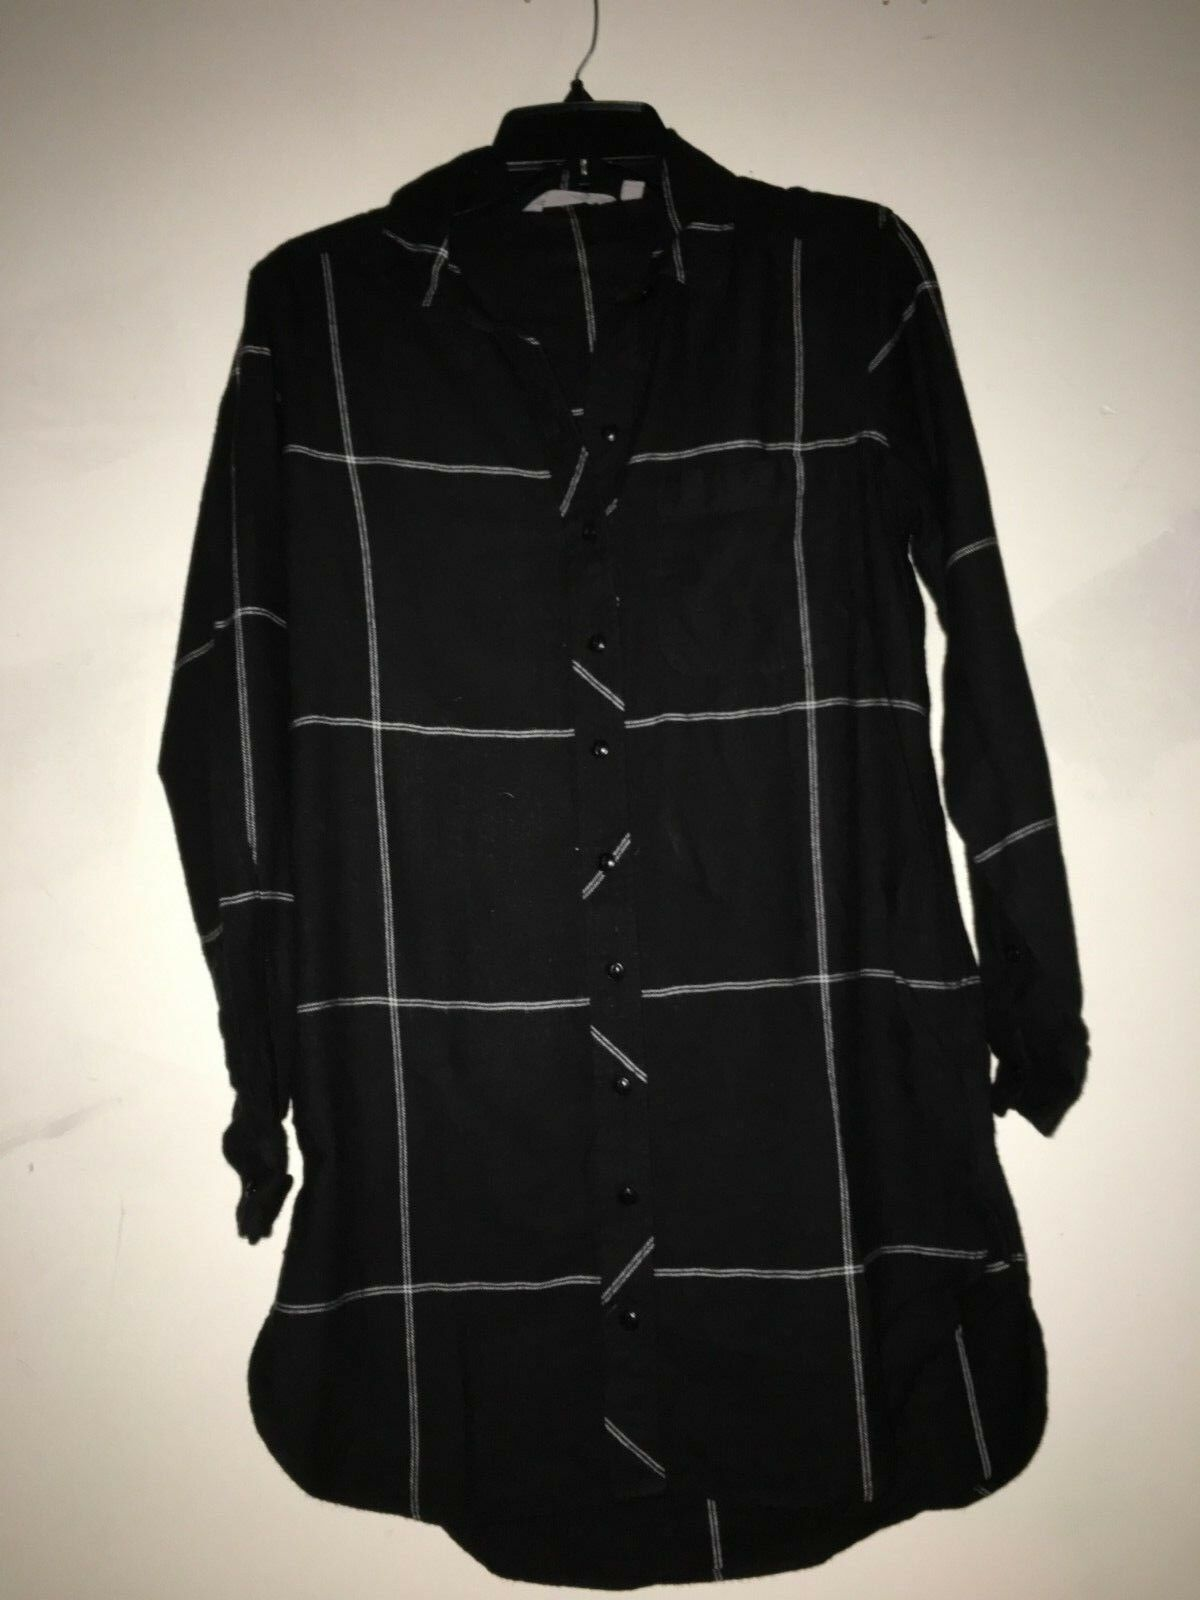 Athleta Plaid schwarz Cream Stripe Shirt Dress Stylish damen Größe XS 100% Cotton